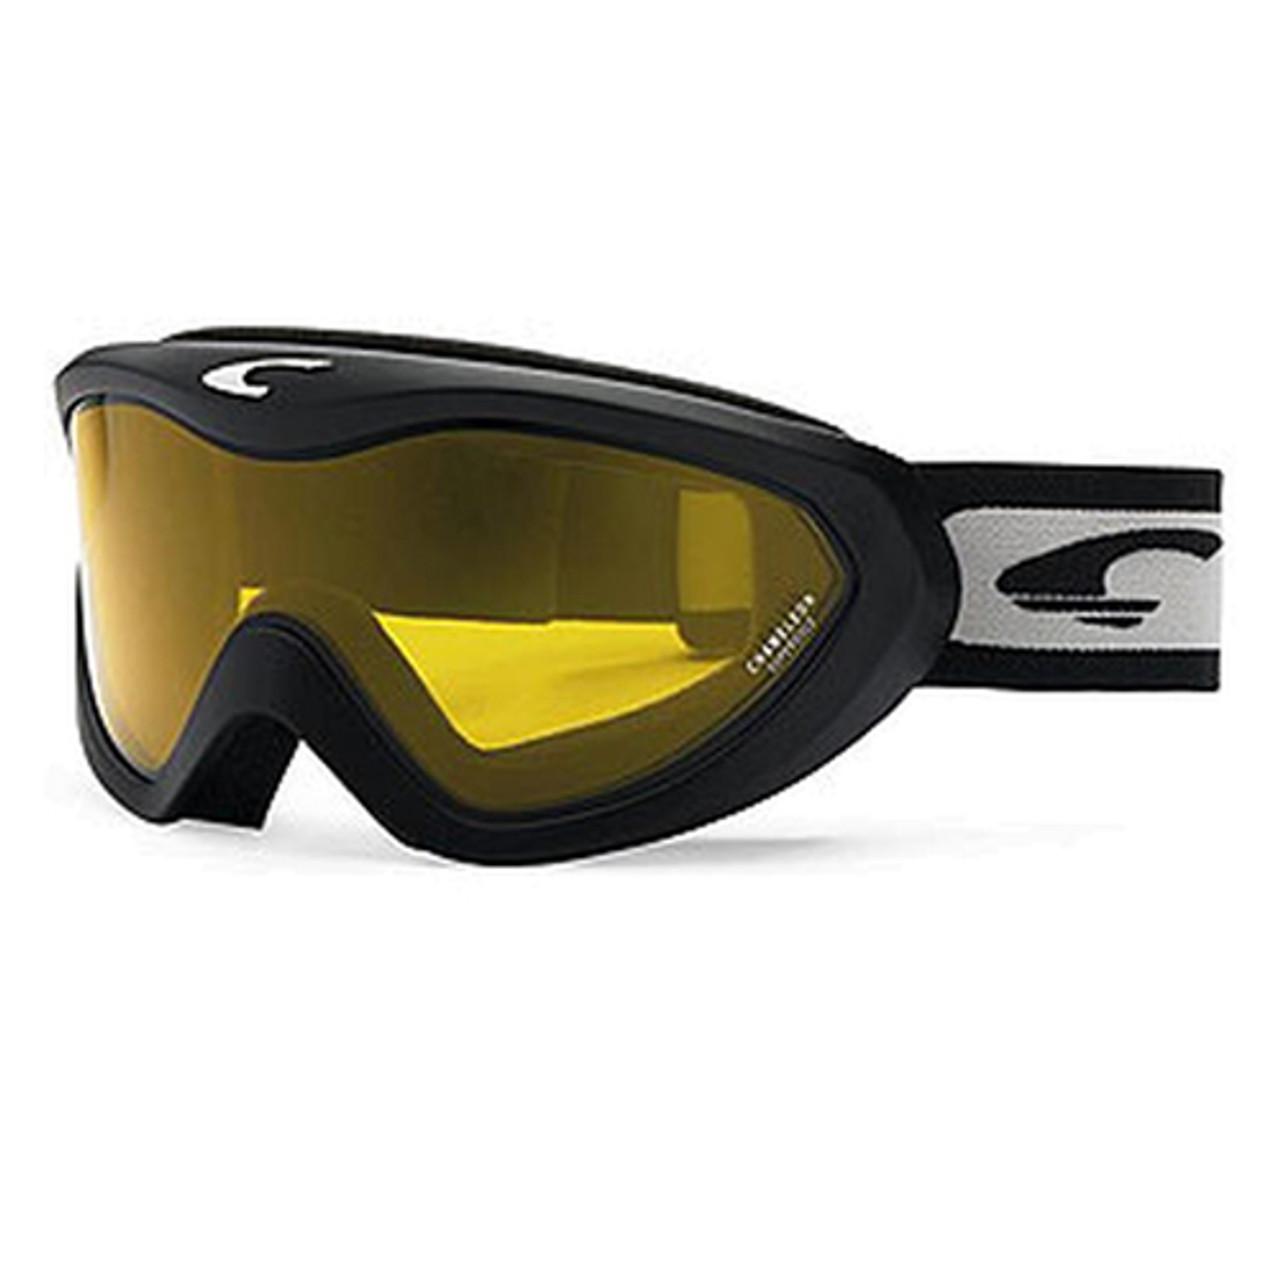 Lens for the Carrera Chameleon Ski Goggles